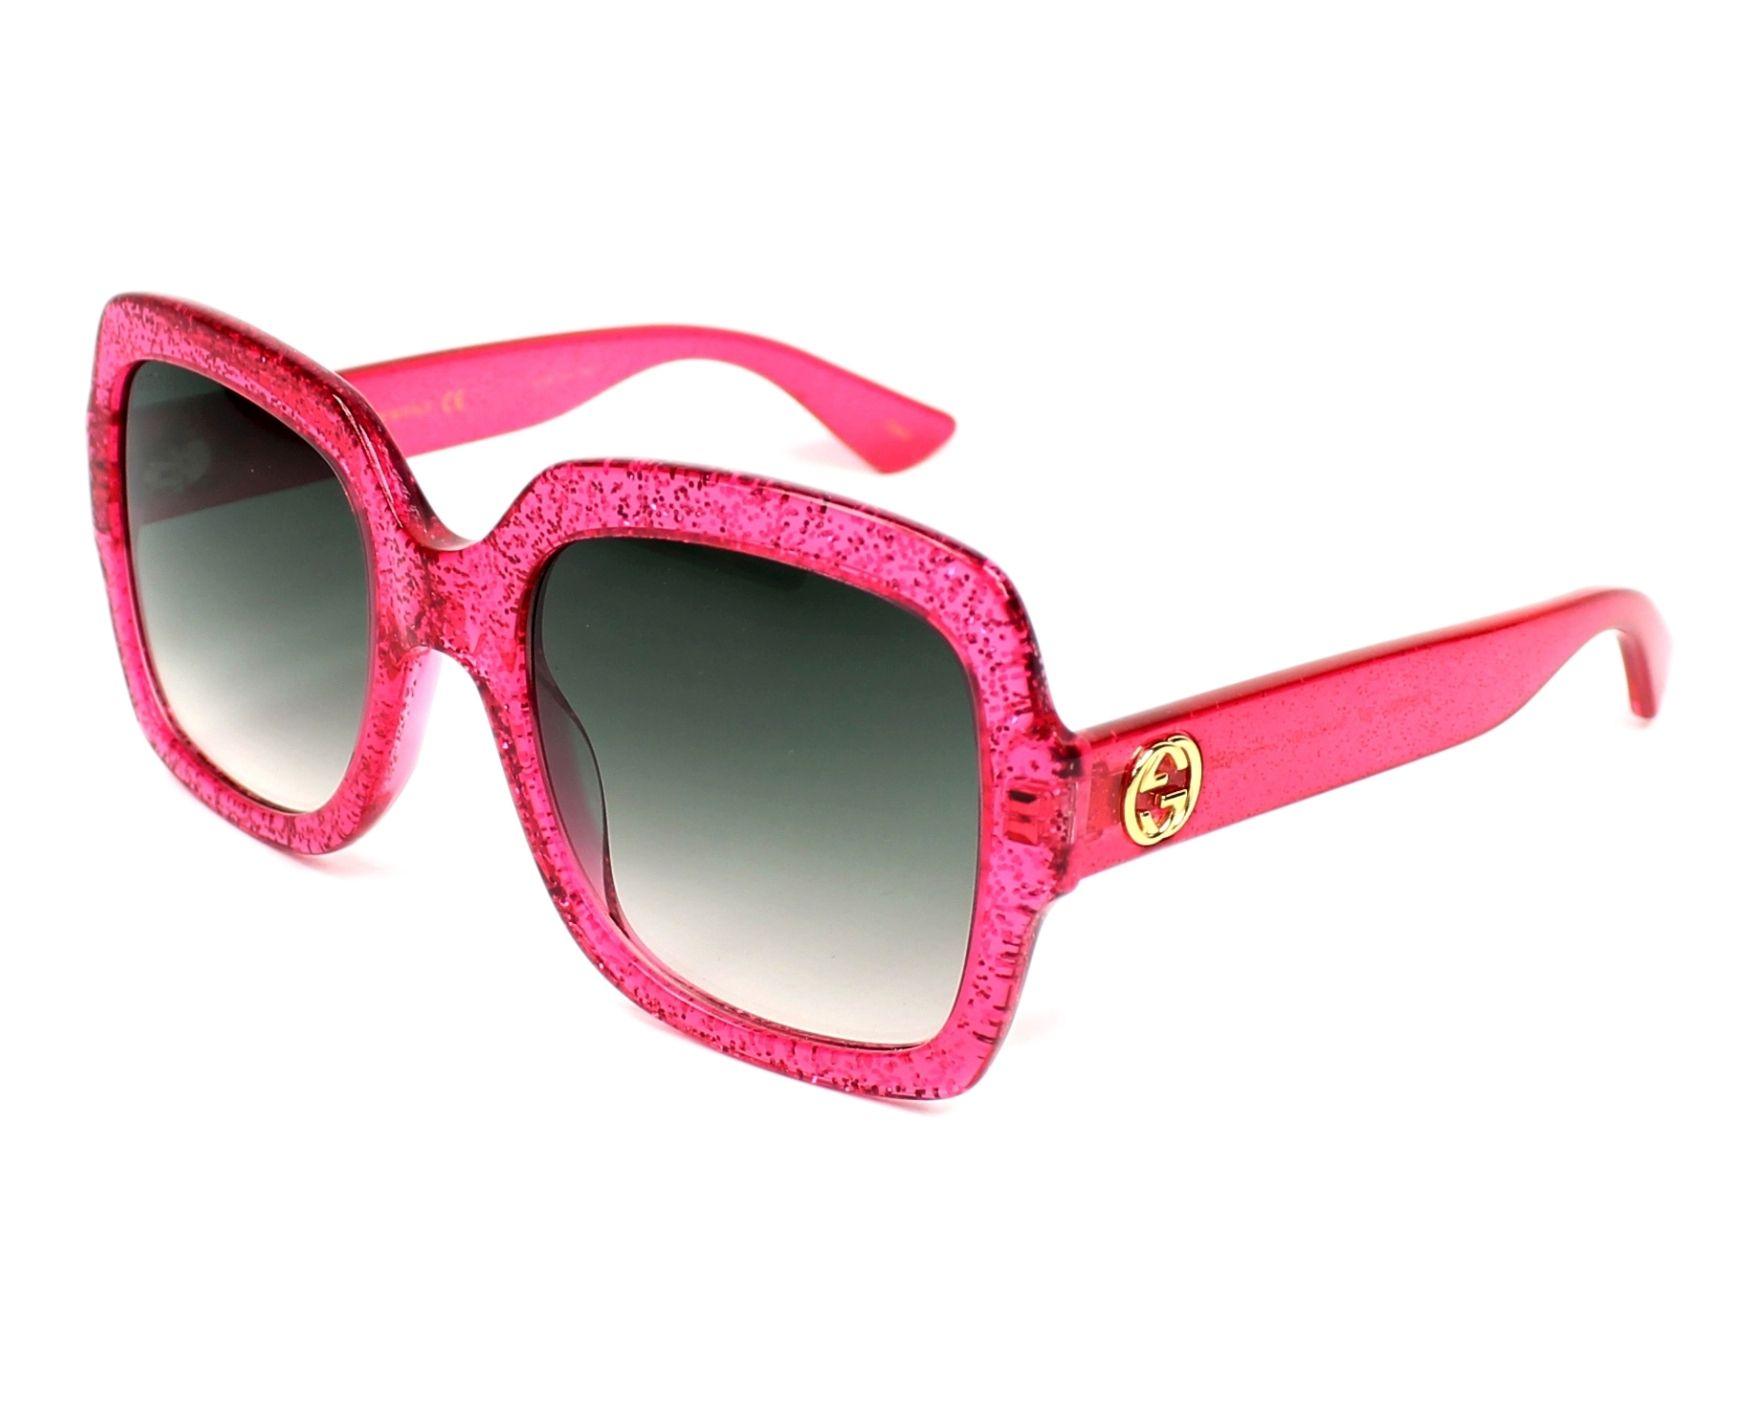 Gucci Sunglasses GG-0036-S 007 Pink - Visionet